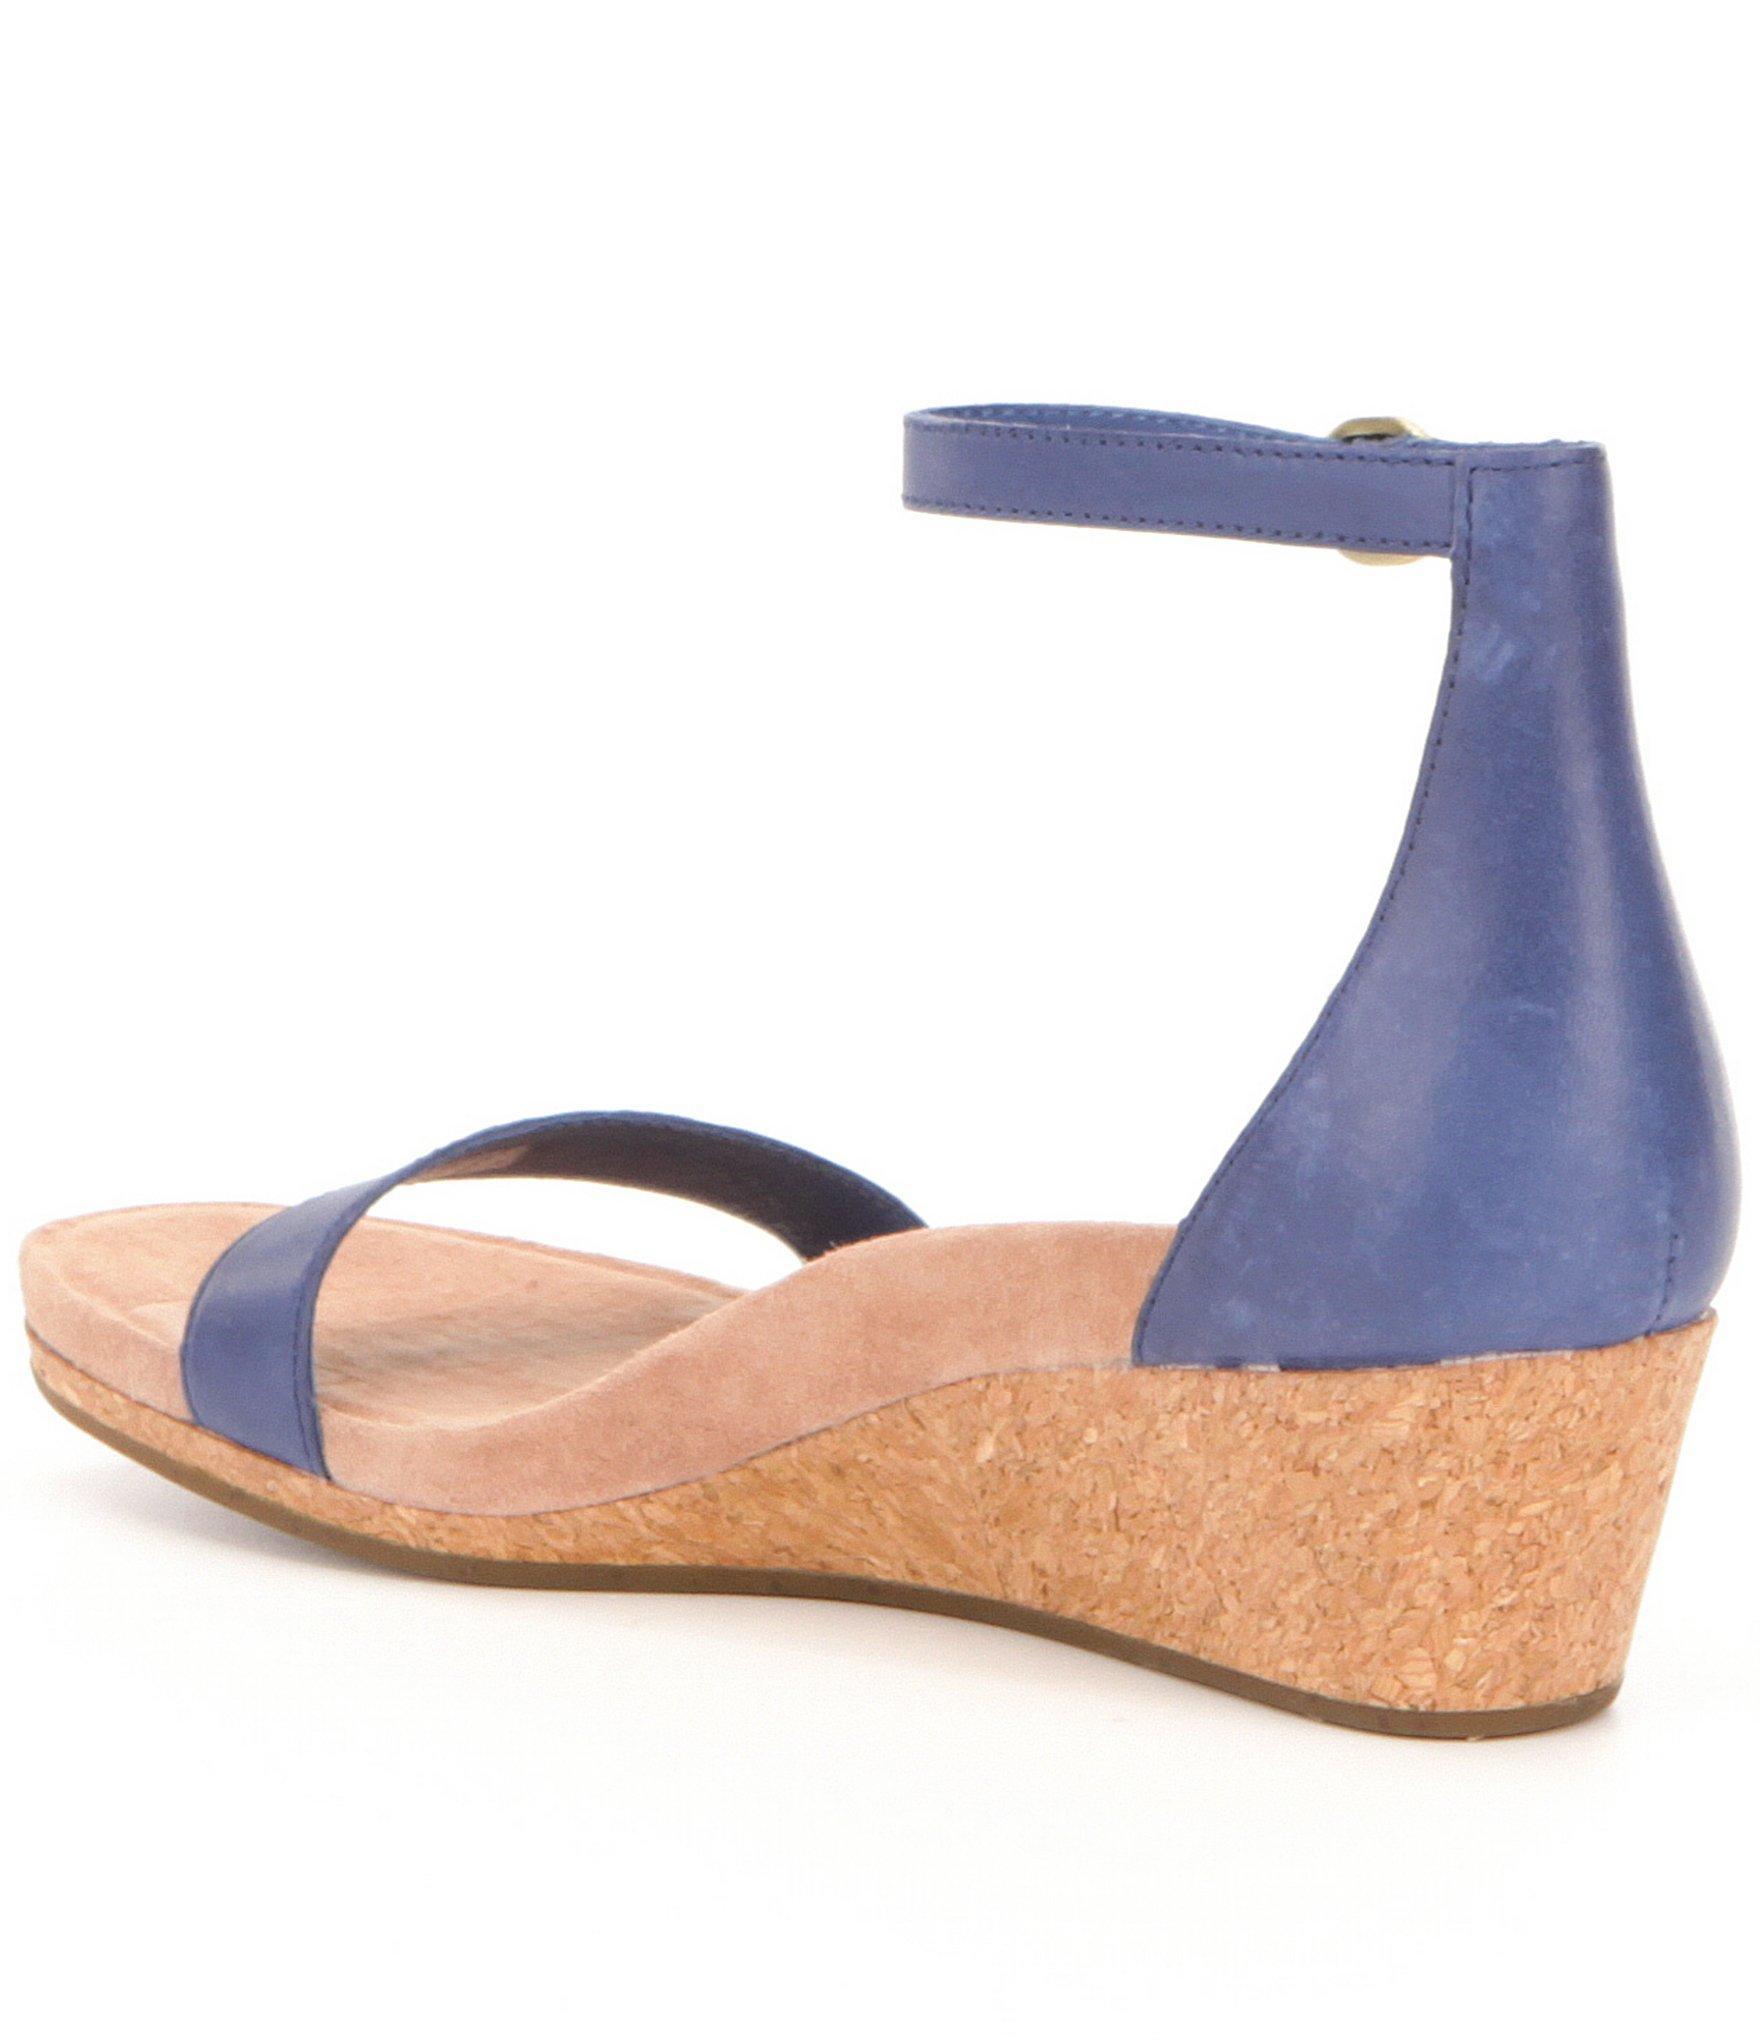 Lyst Ugg Emilia Wedge Sandals In Blue